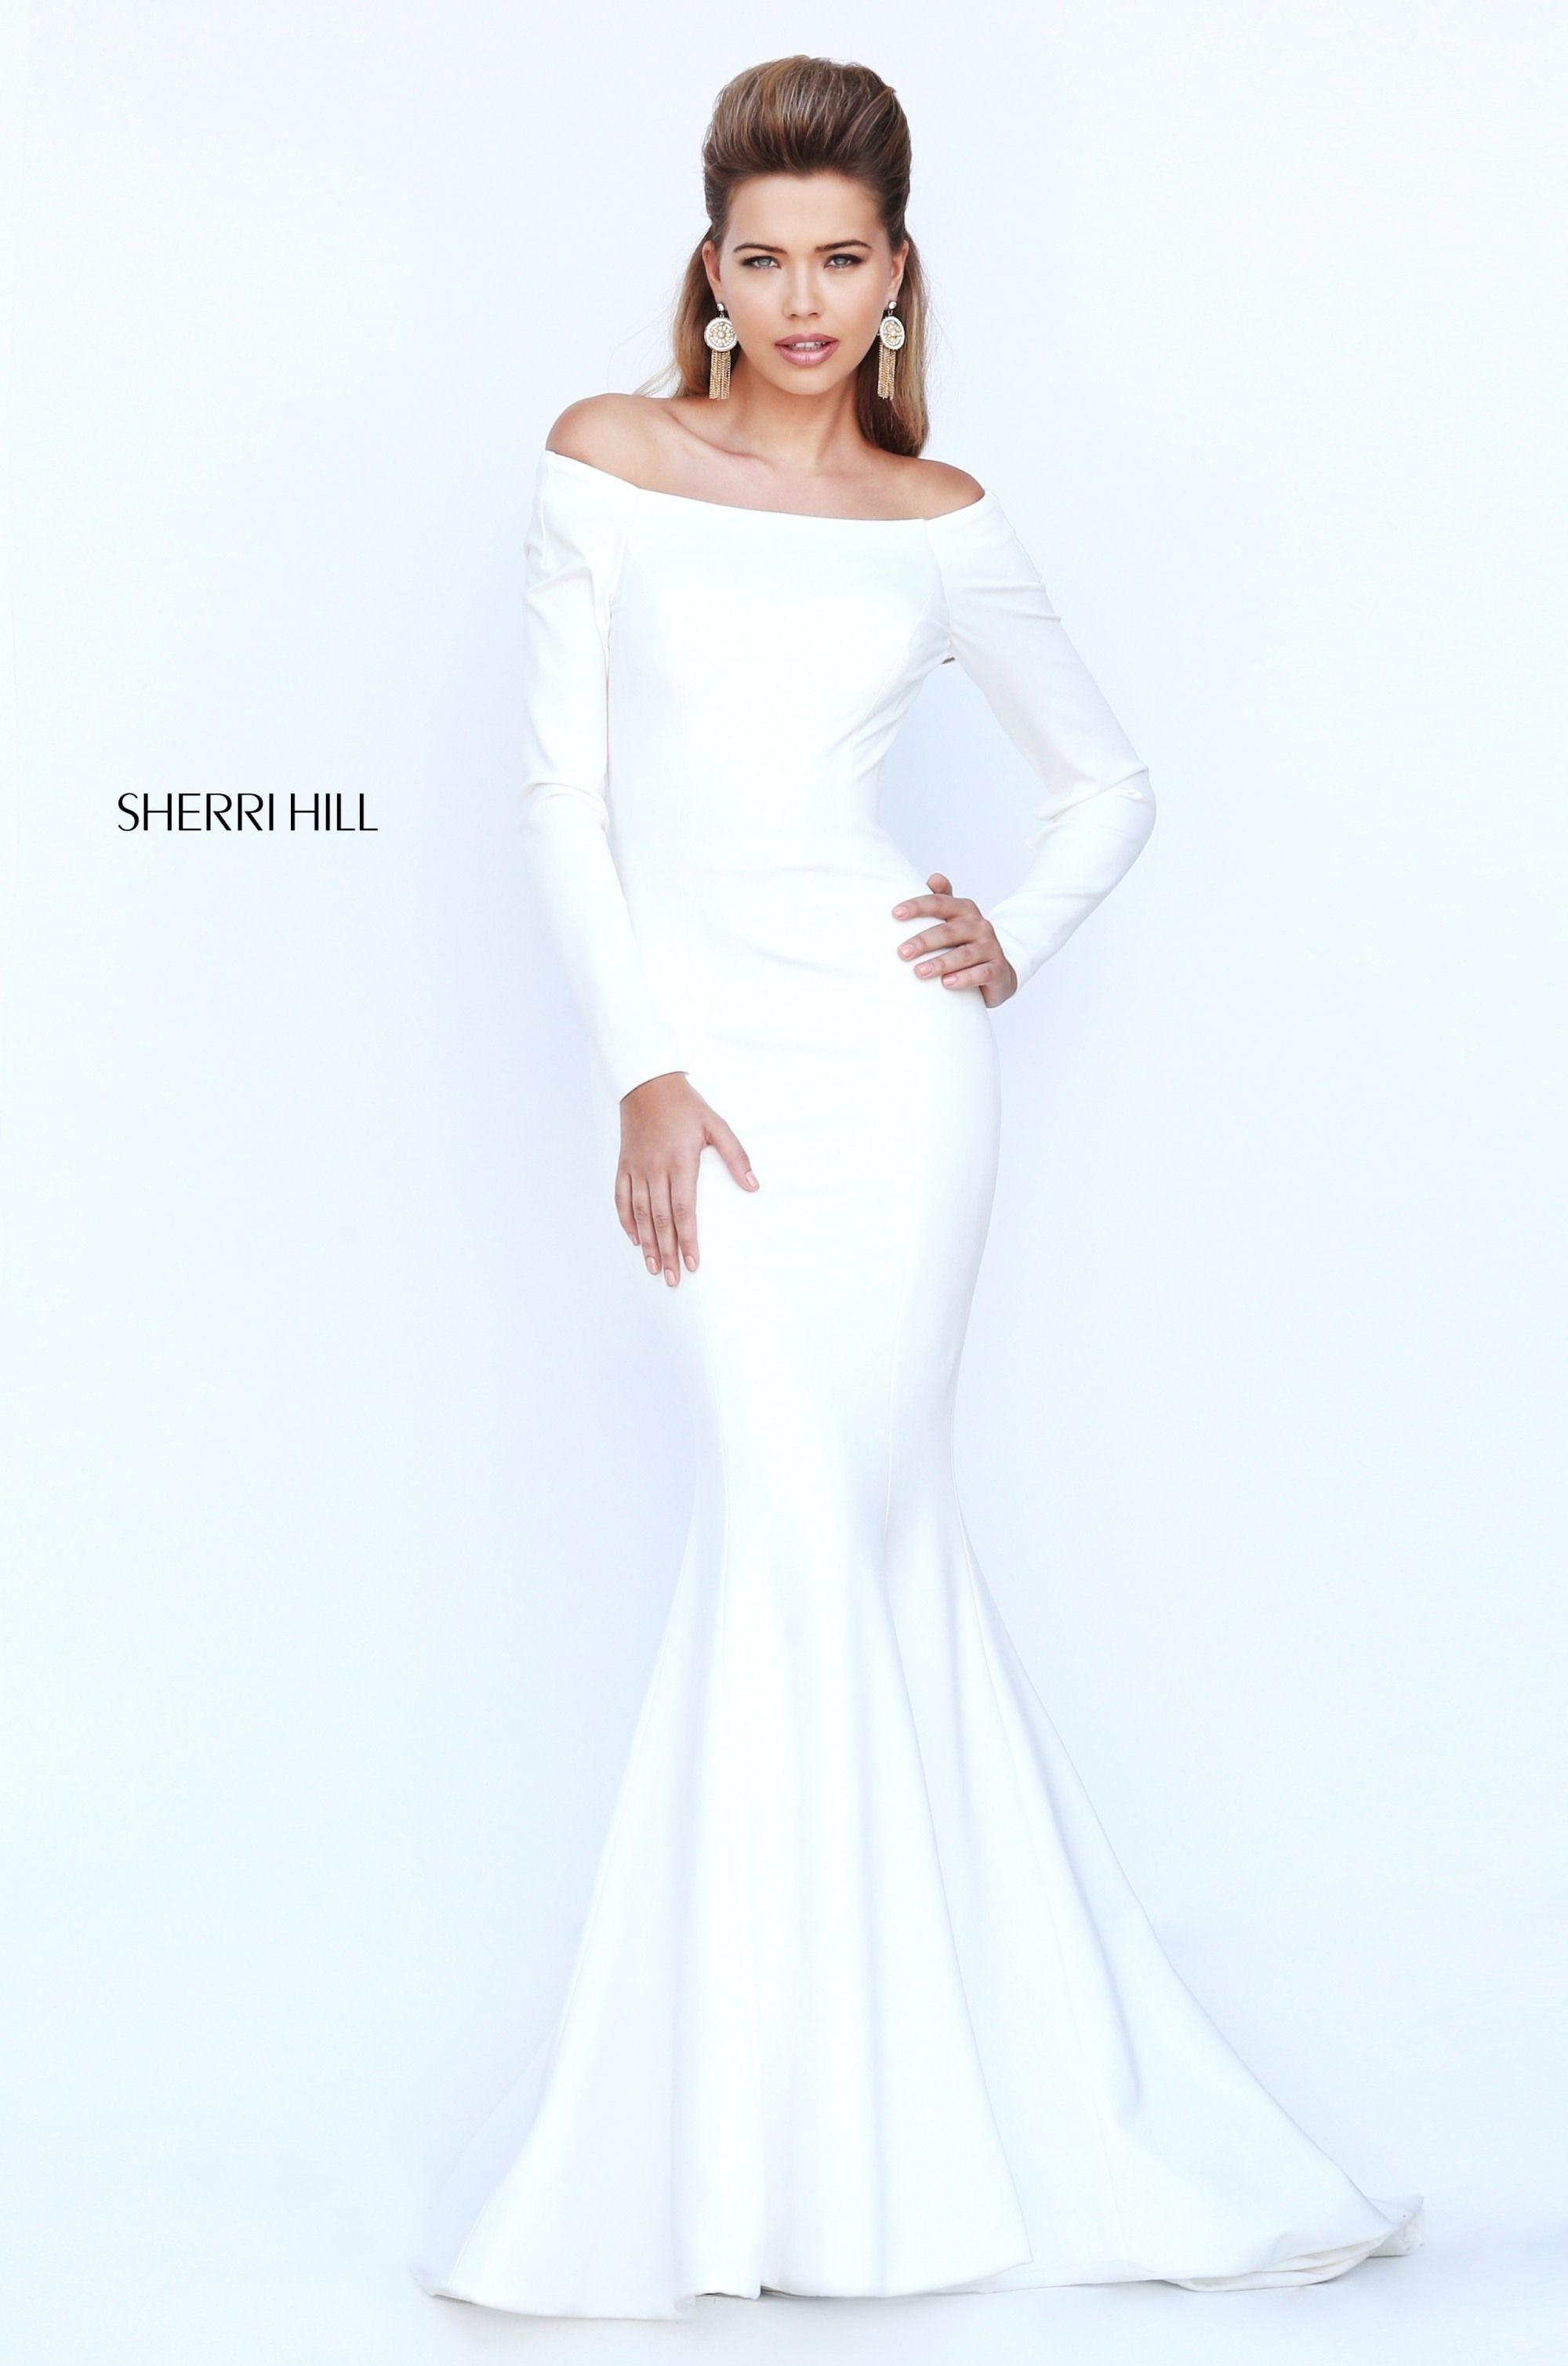 76ccbbbb9fd8 Sherri Hill 52511 Meghan Markle Royal Wedding Dress has Scuba material w  invisible zipper and a slight train.